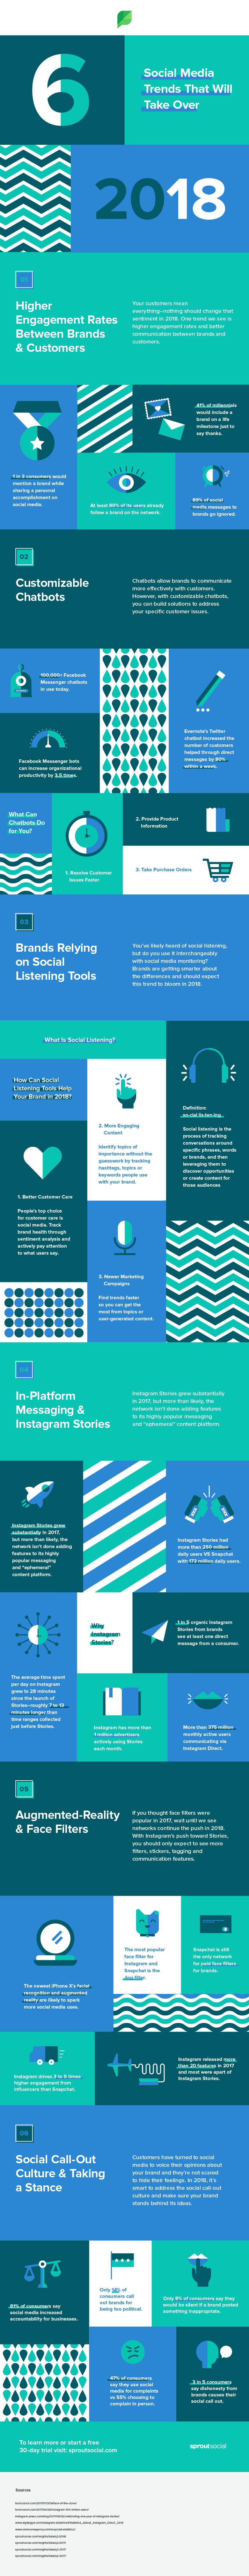 Social Media Trends 2018 Infographic